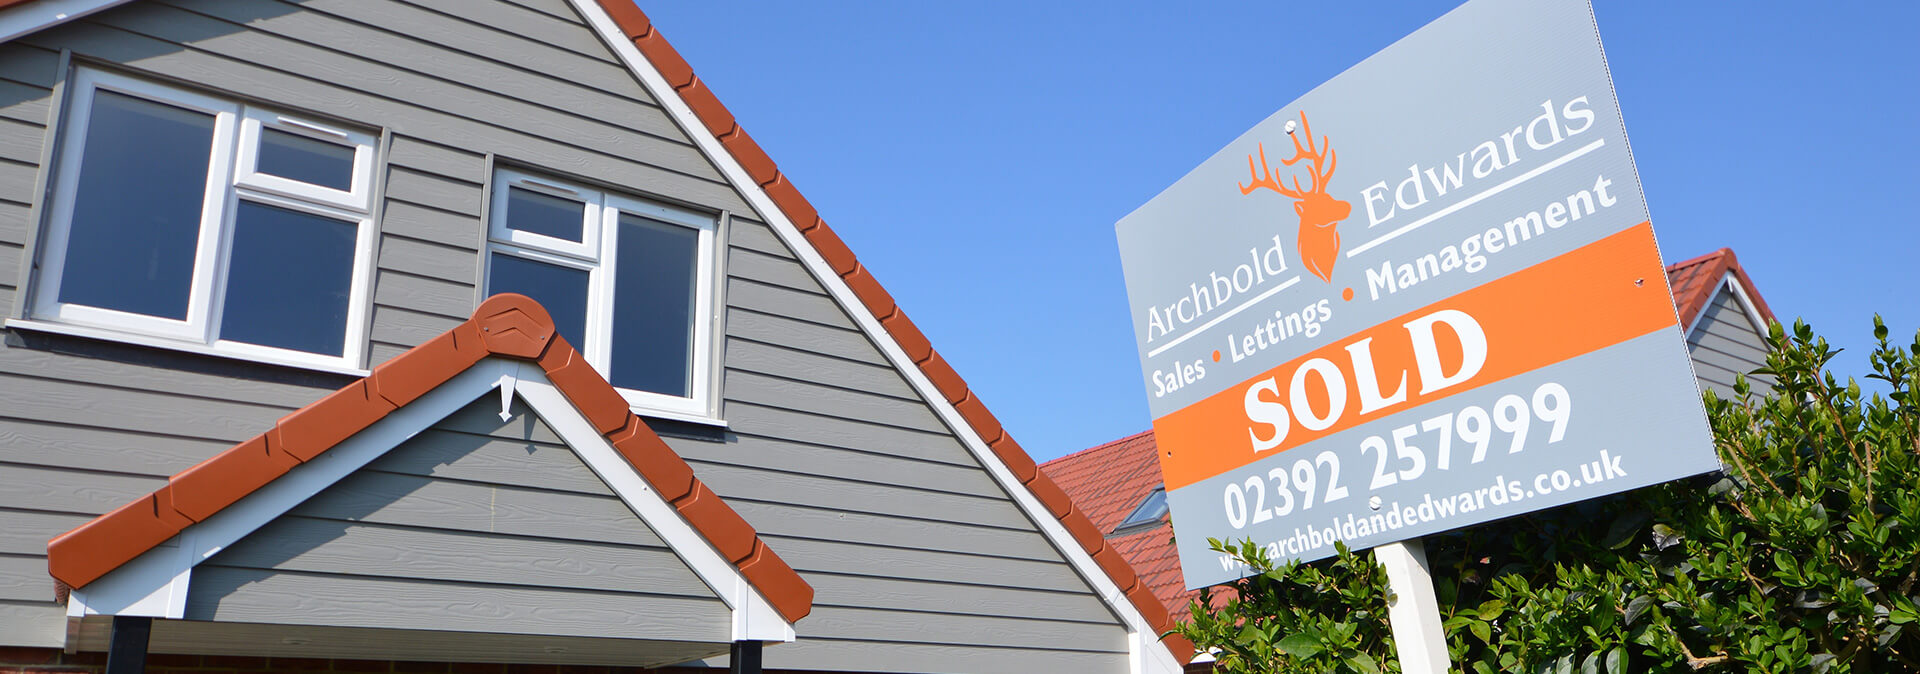 Archbold & Edwards sold board